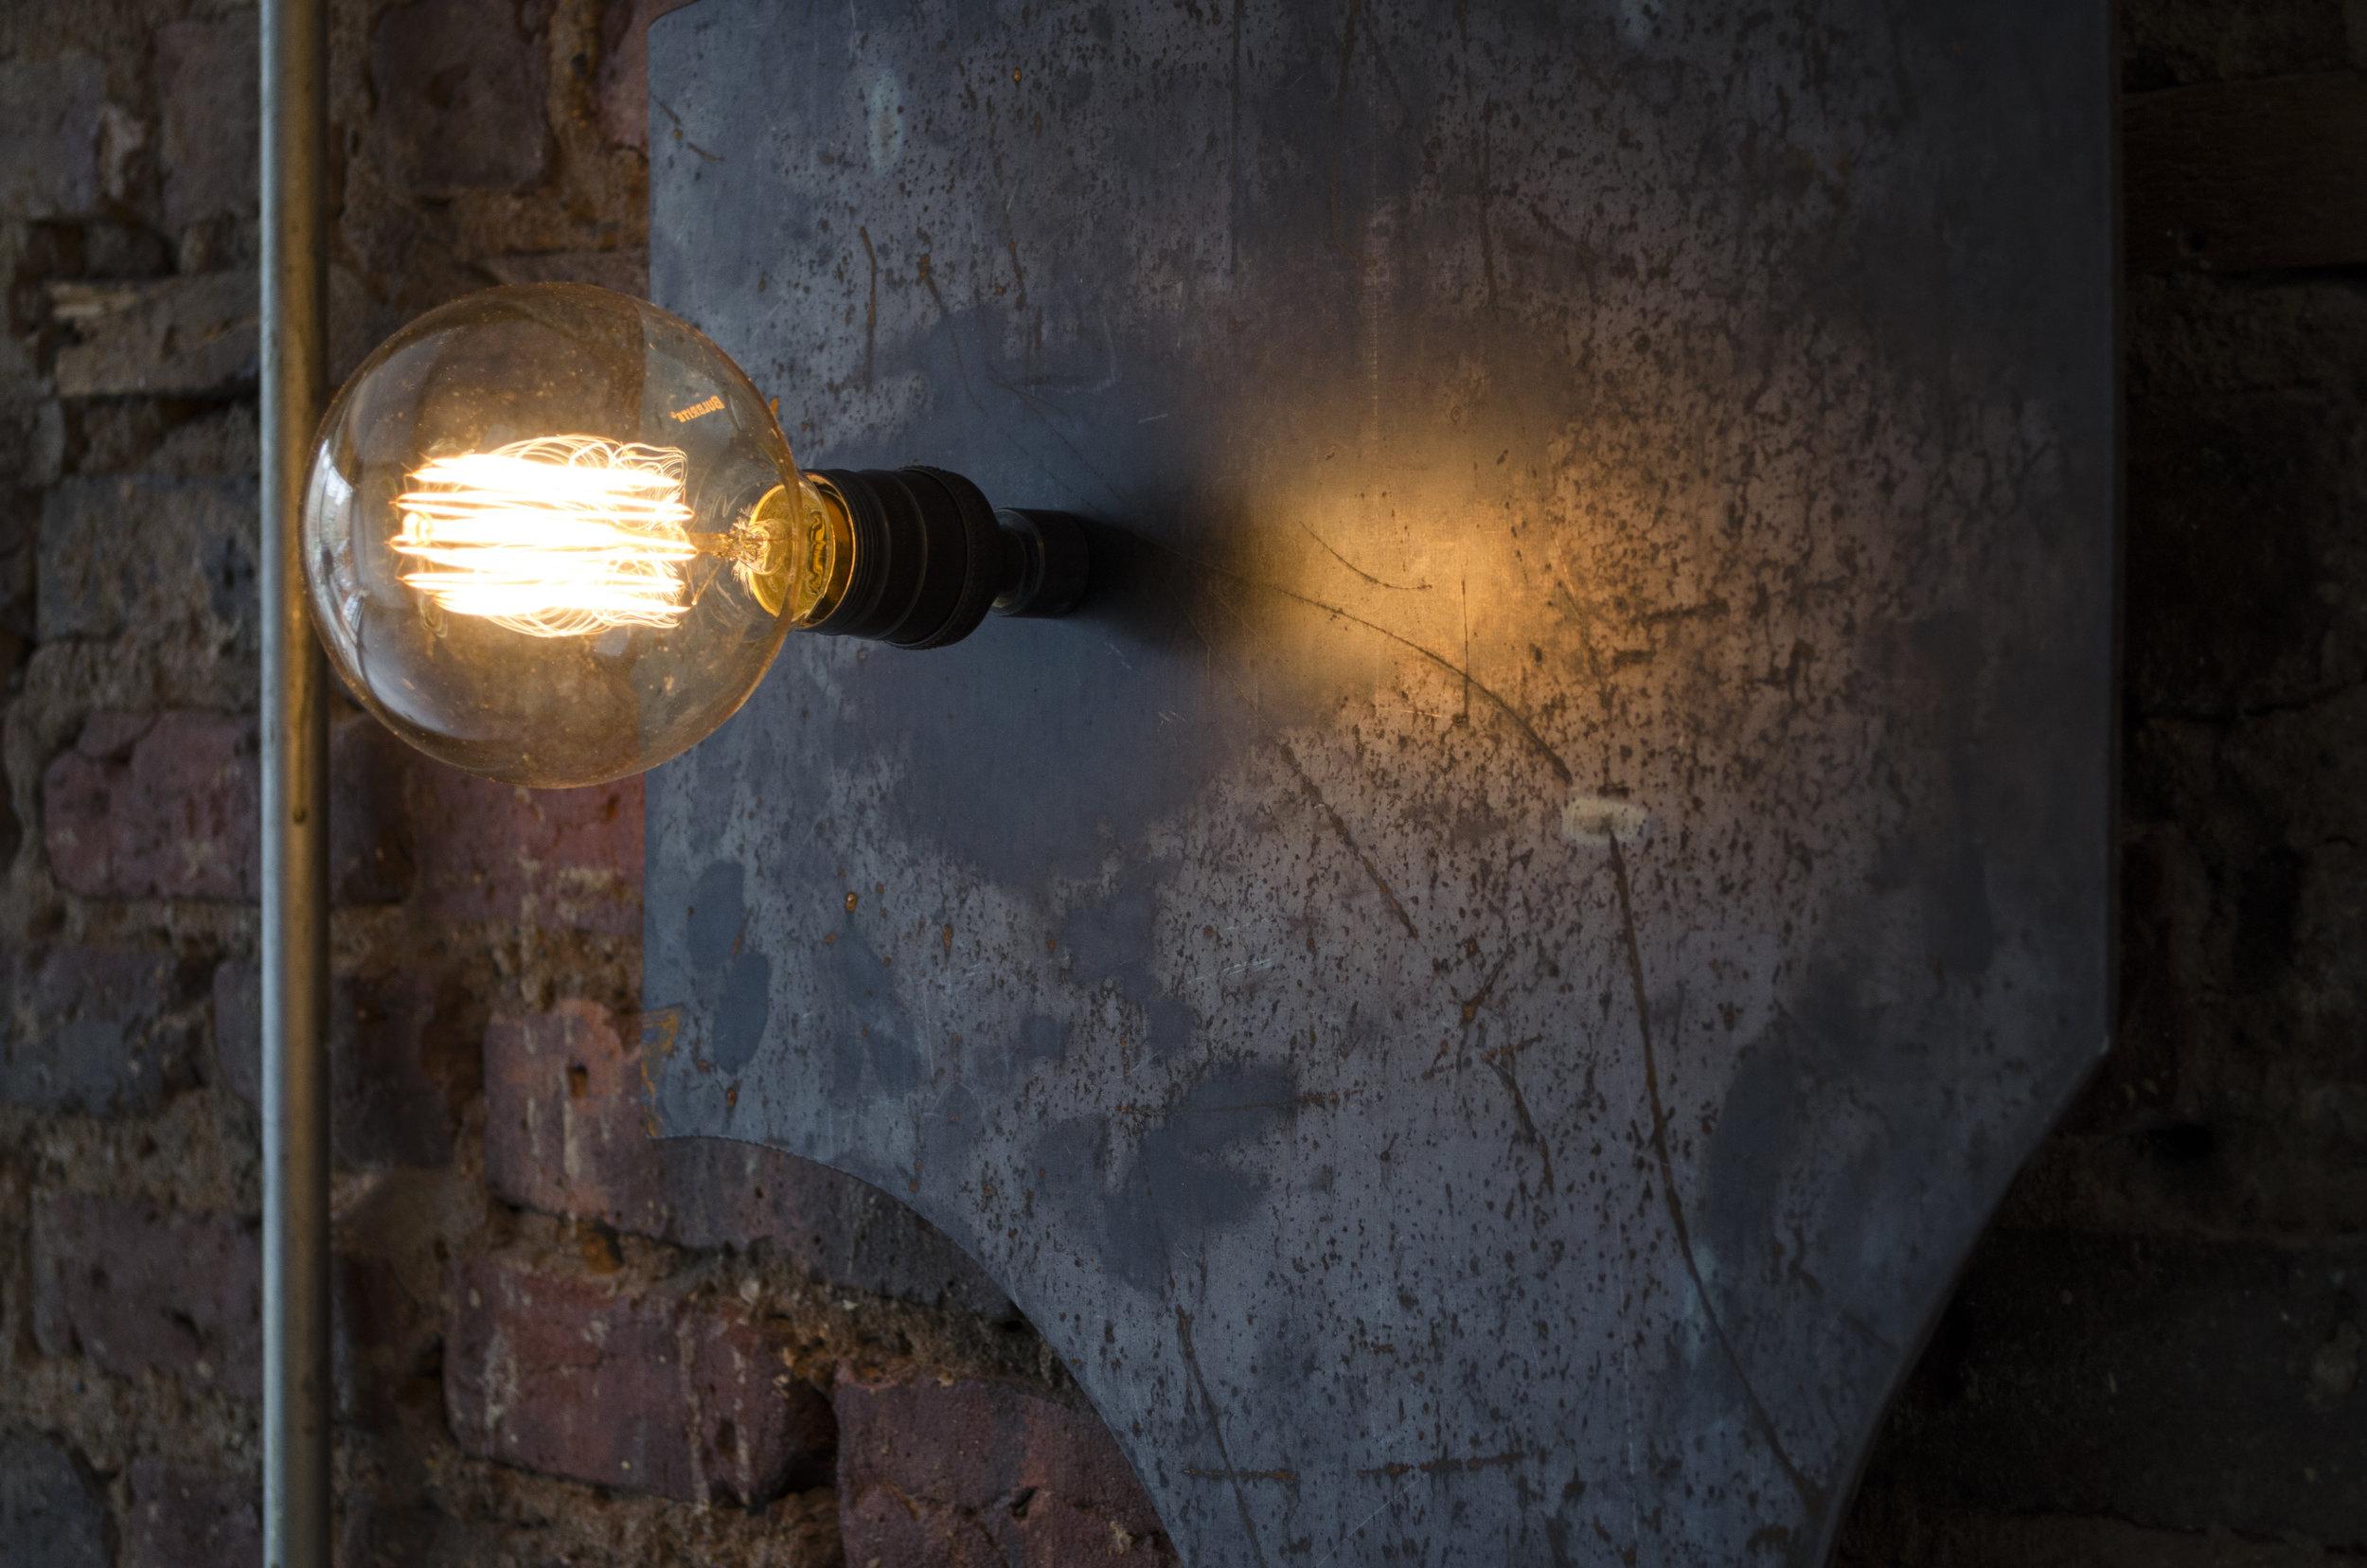 Sarah Entwistle,  Offcut lamp #8  (detail), 2019